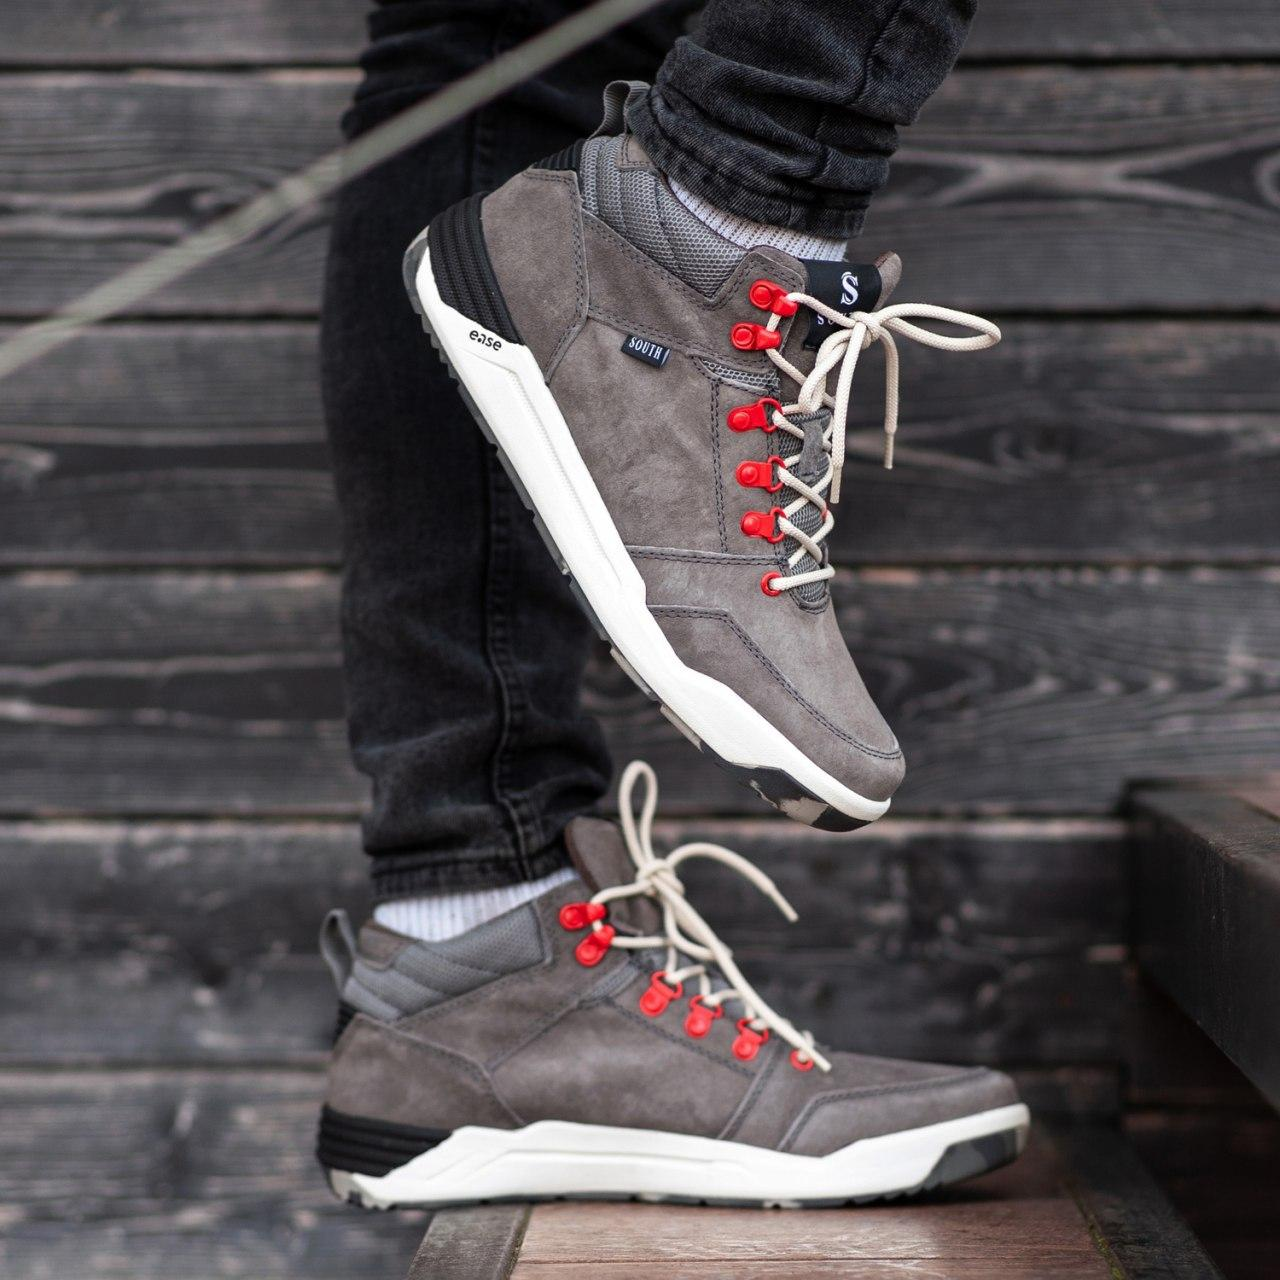 Ботинки South fenix grey - фото 3